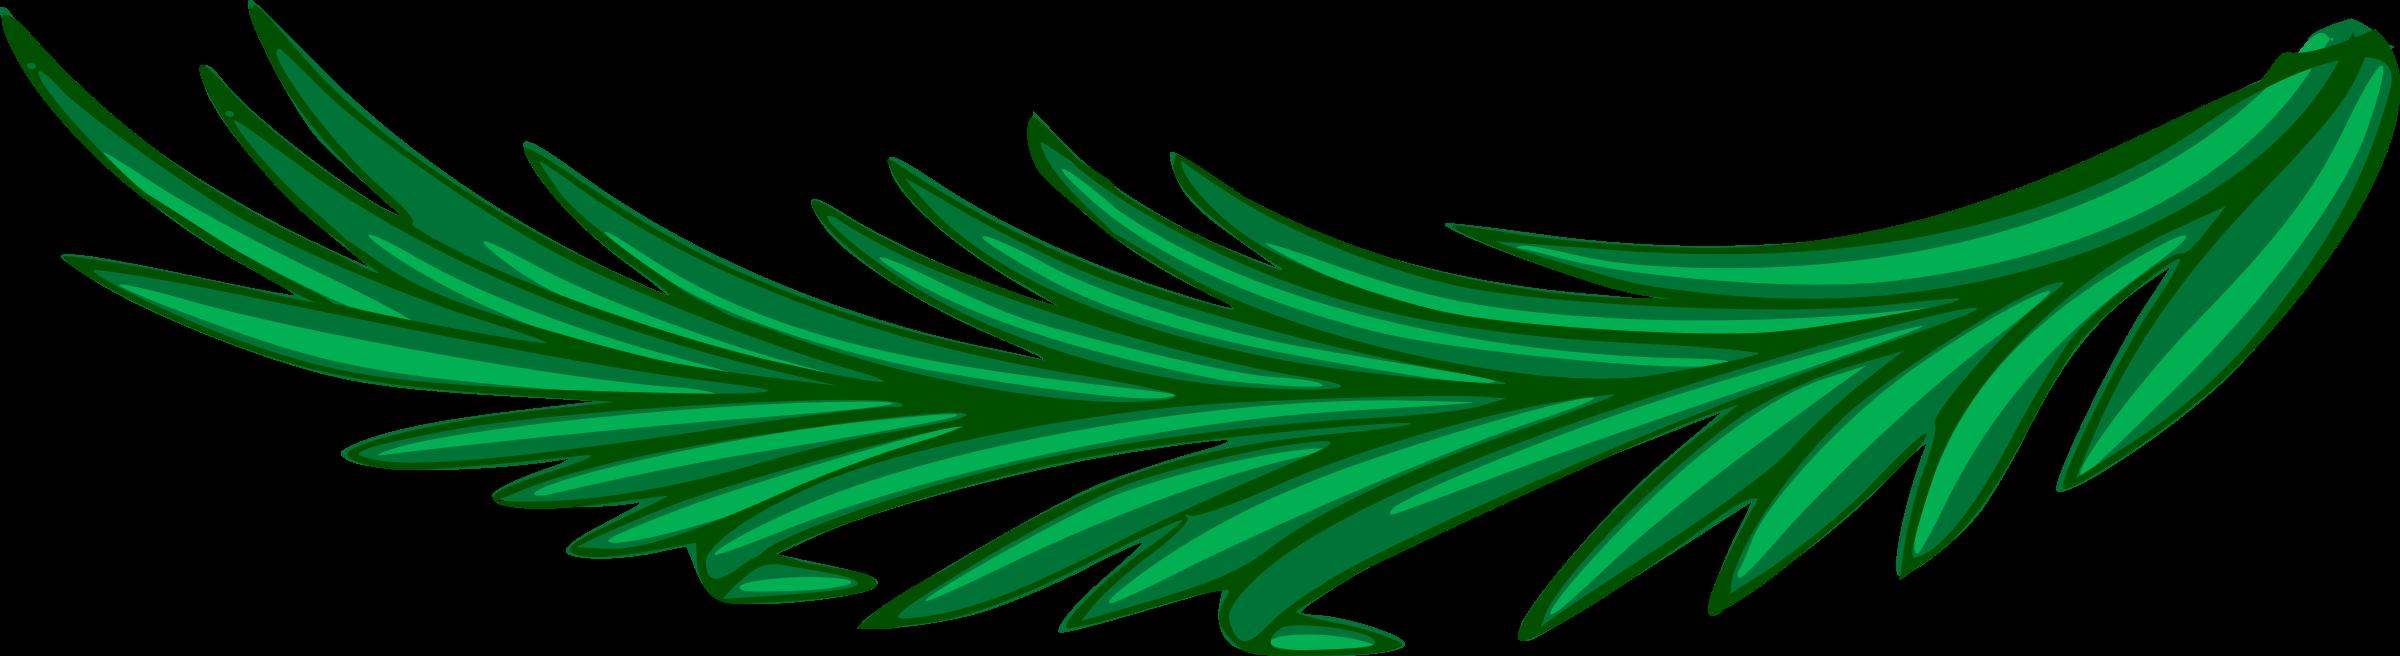 Branch big image png. Laurel clipart green